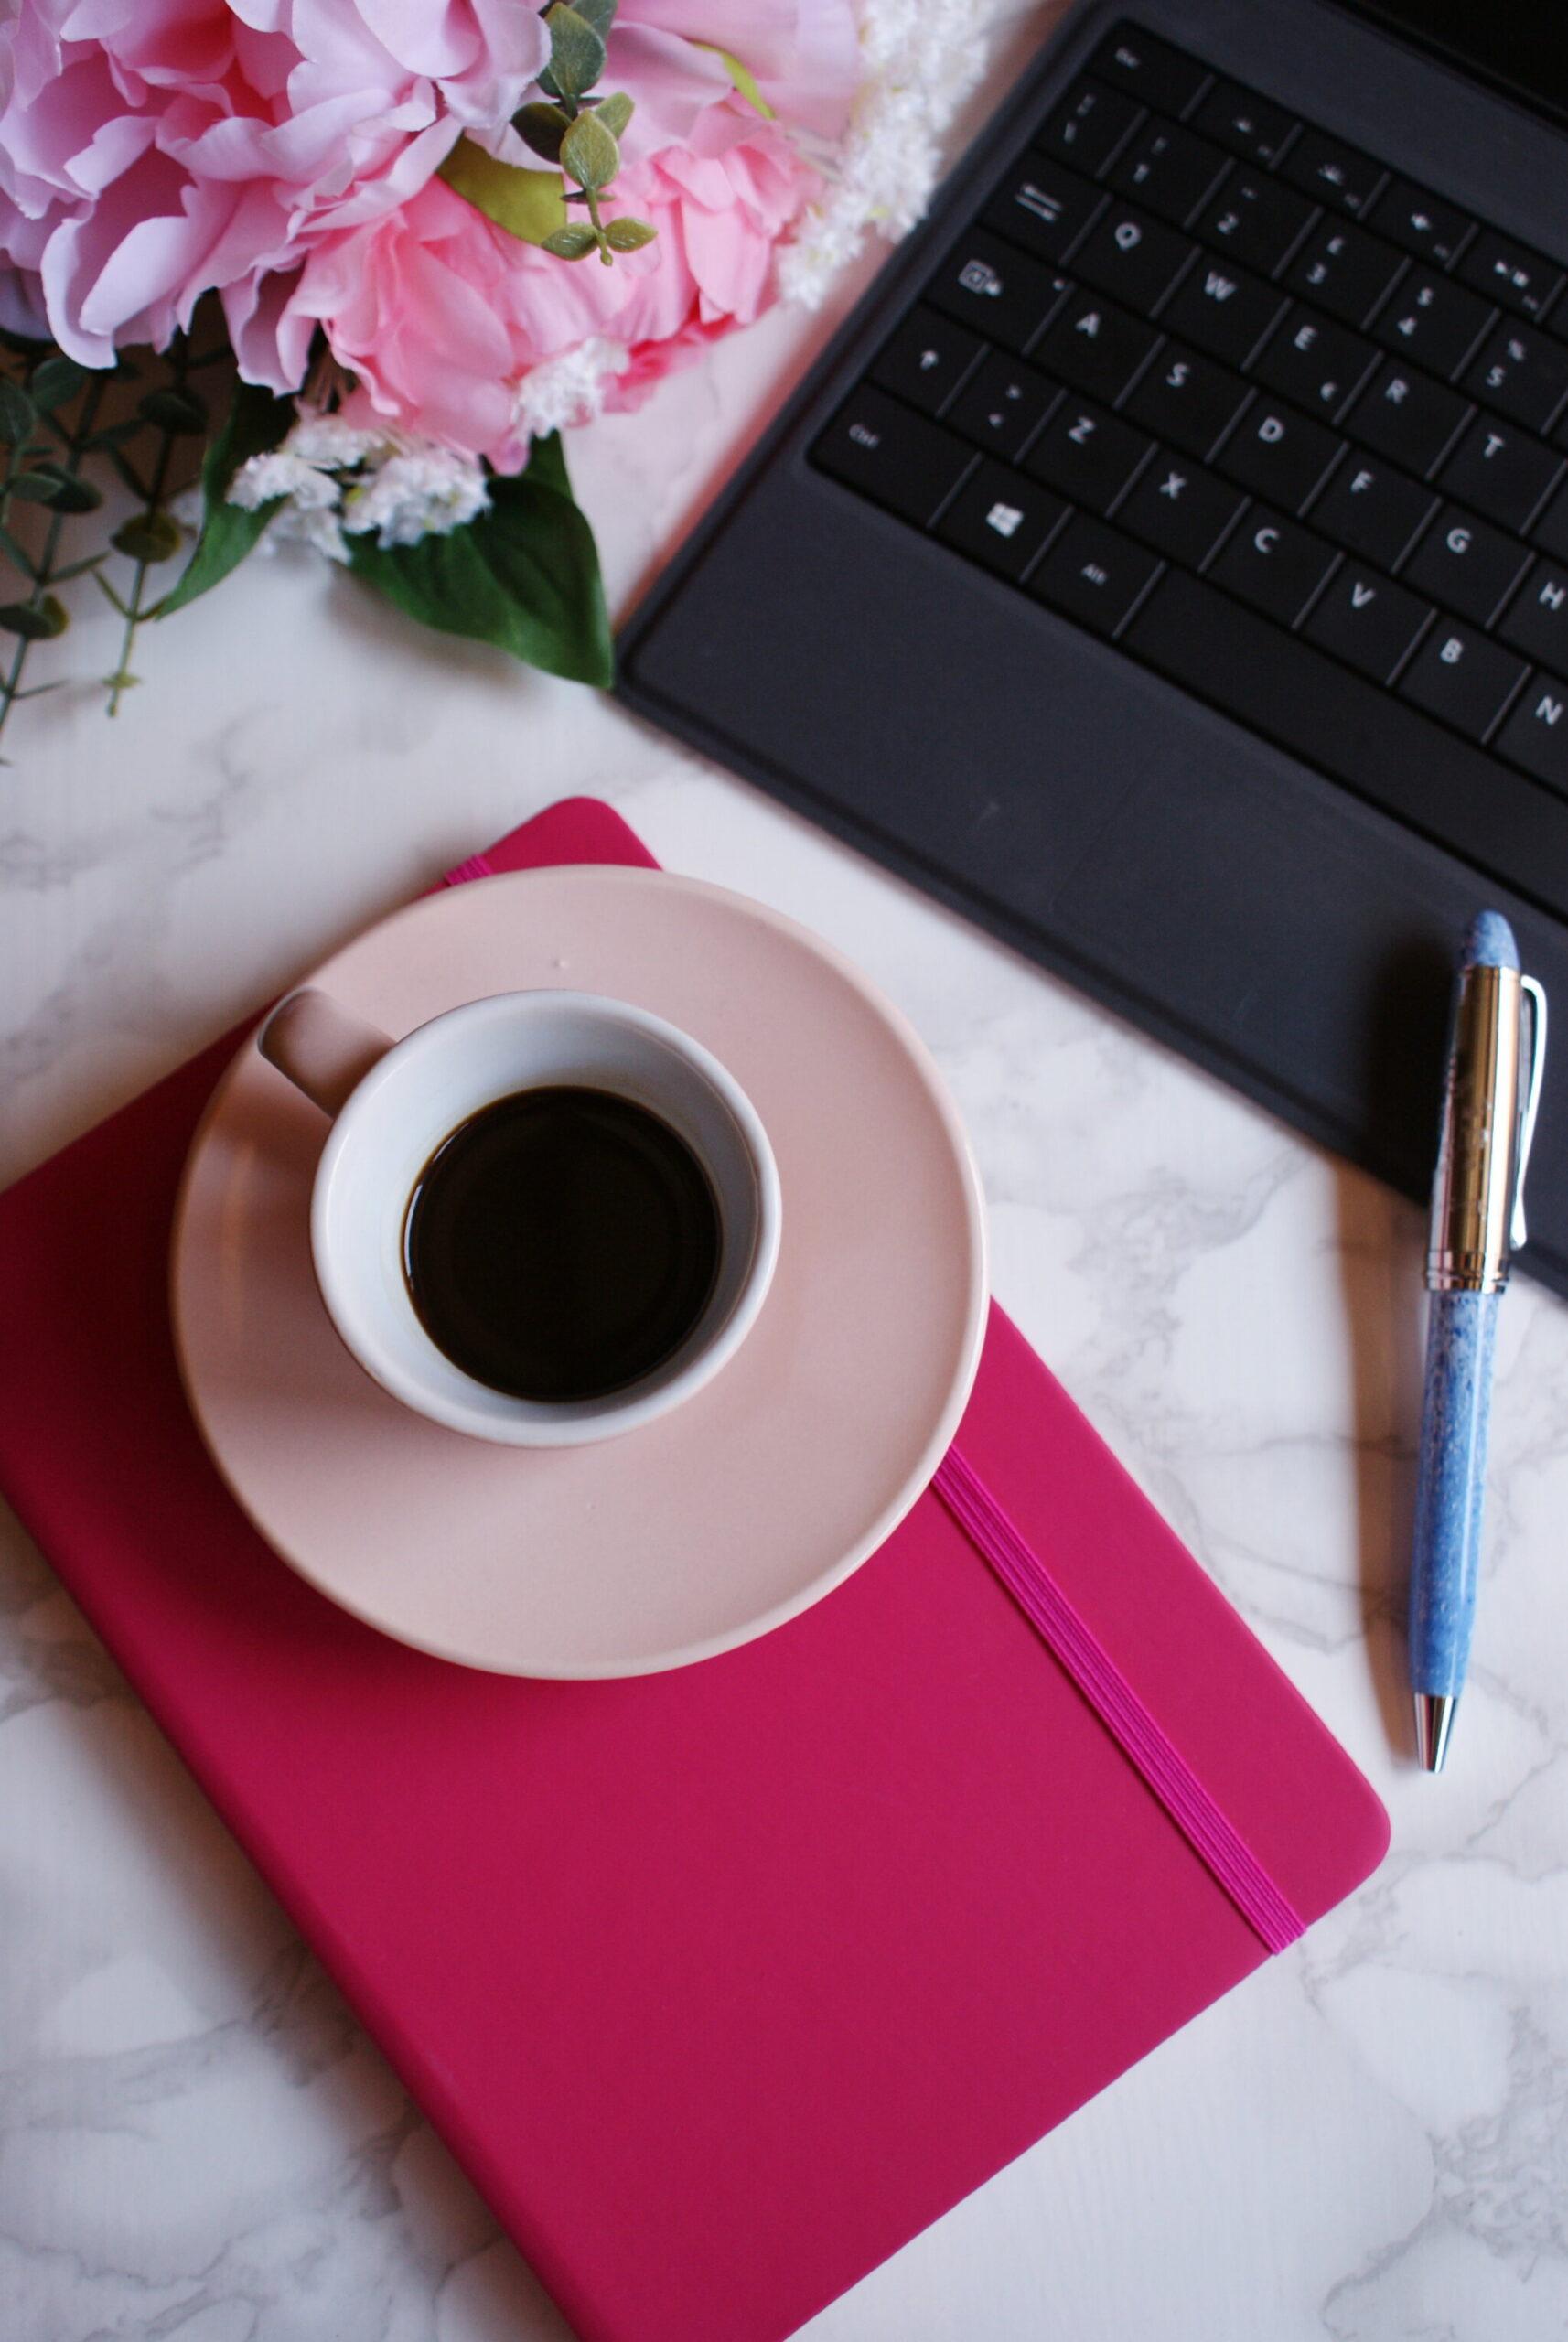 blog tips guide beginner money success